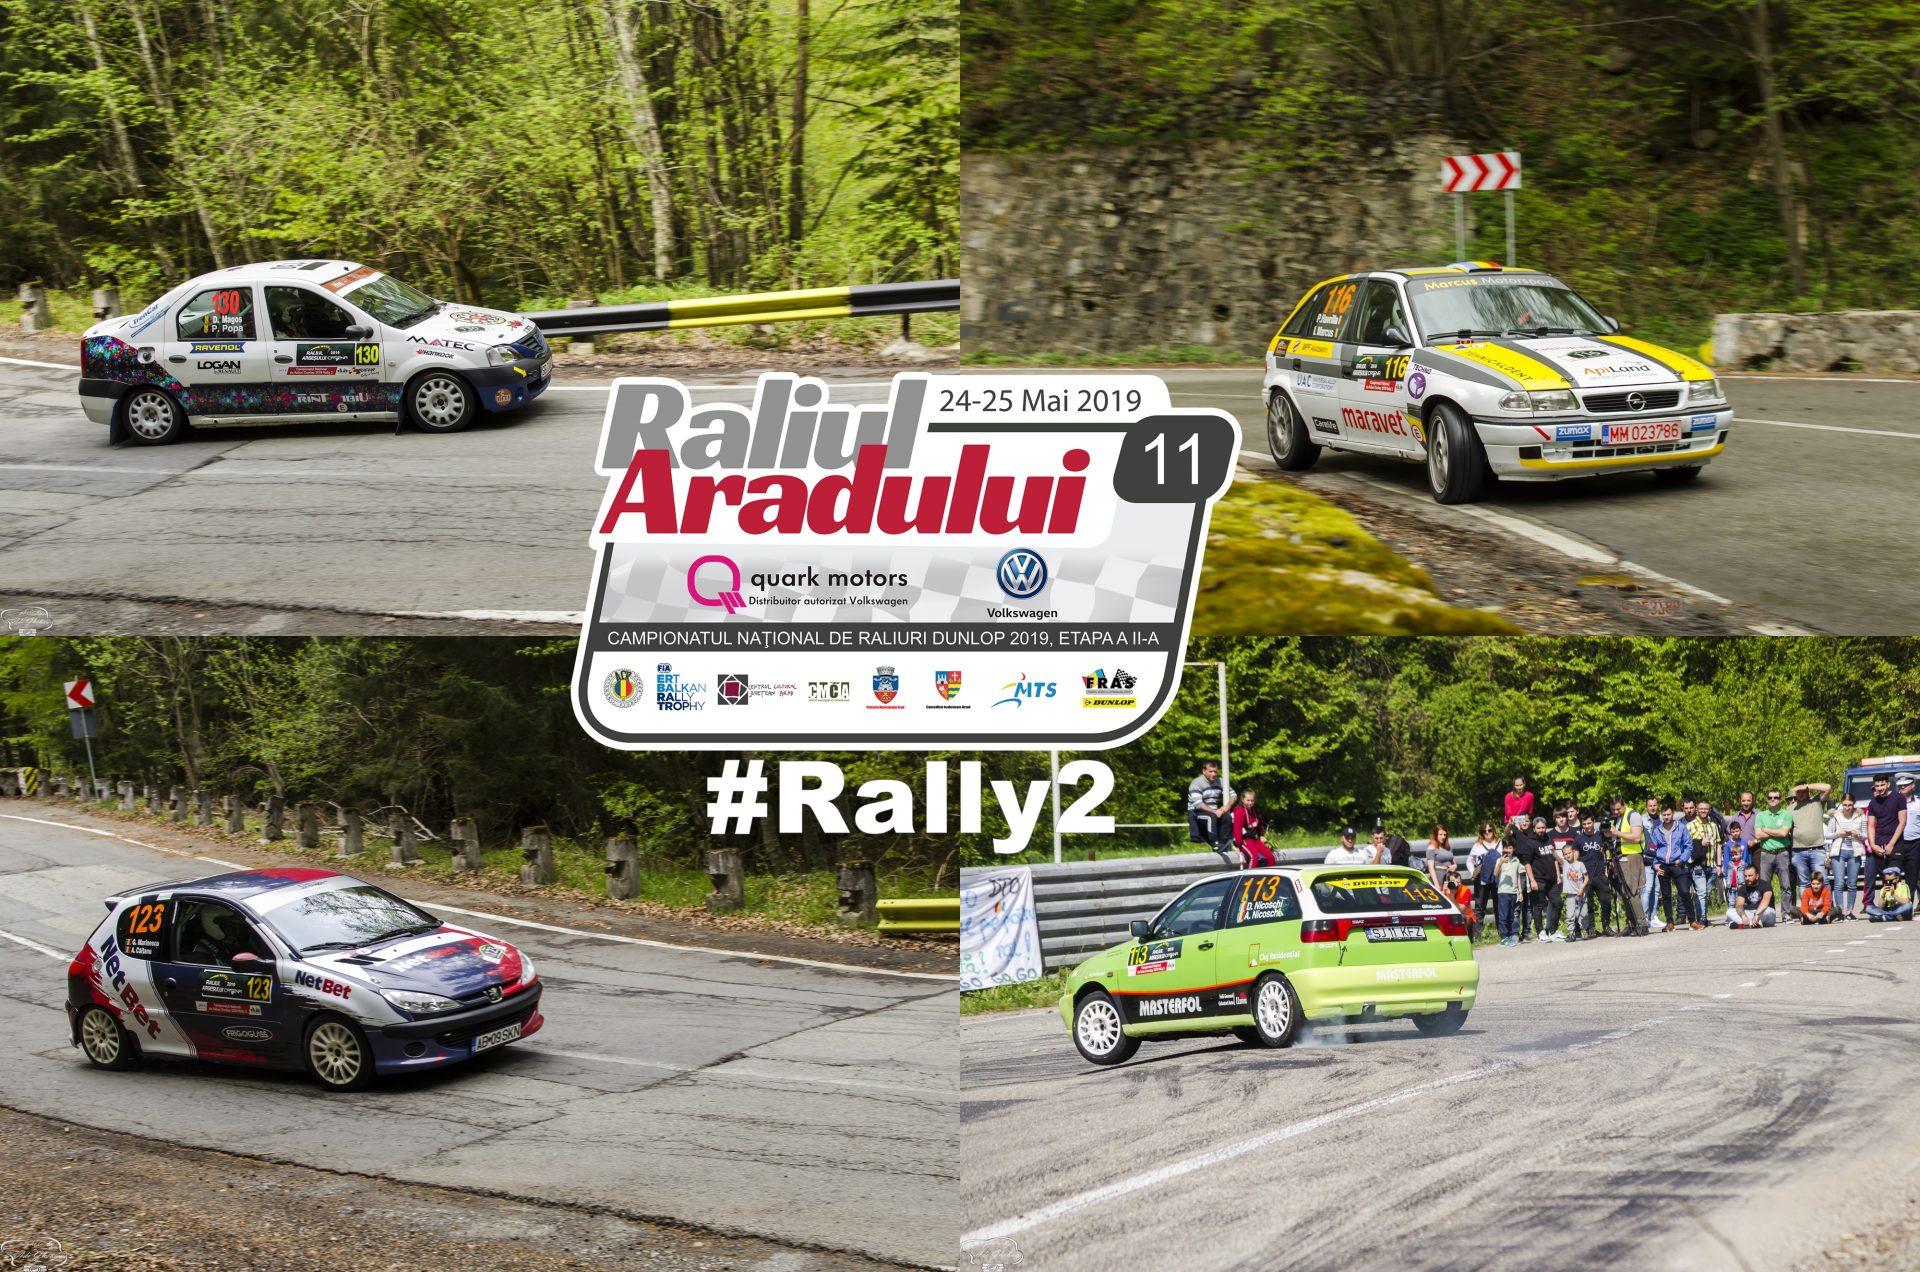 Rally2 se anunta interesant la Raliul Aradului 2019